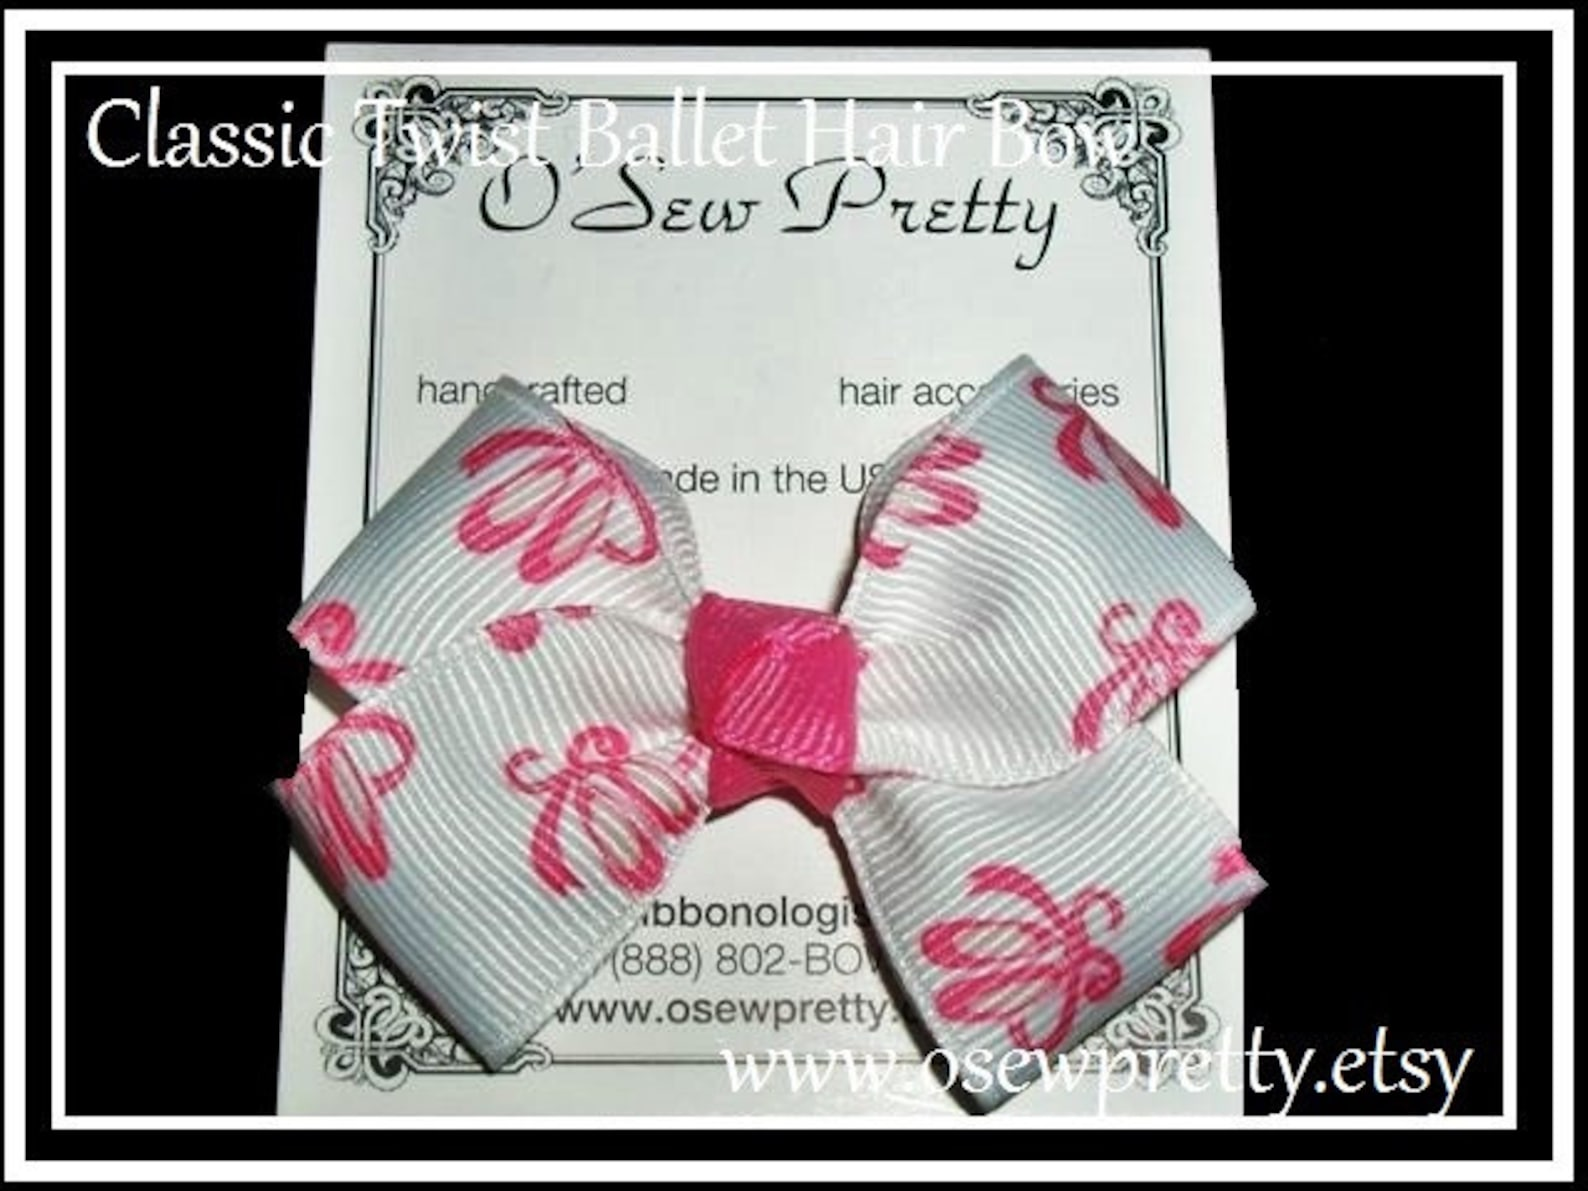 ballet hair bows, pink ballet shoe hair bows, hair bows for ballet, classic ballet hair bows, classic ballet hair bows, ballerin